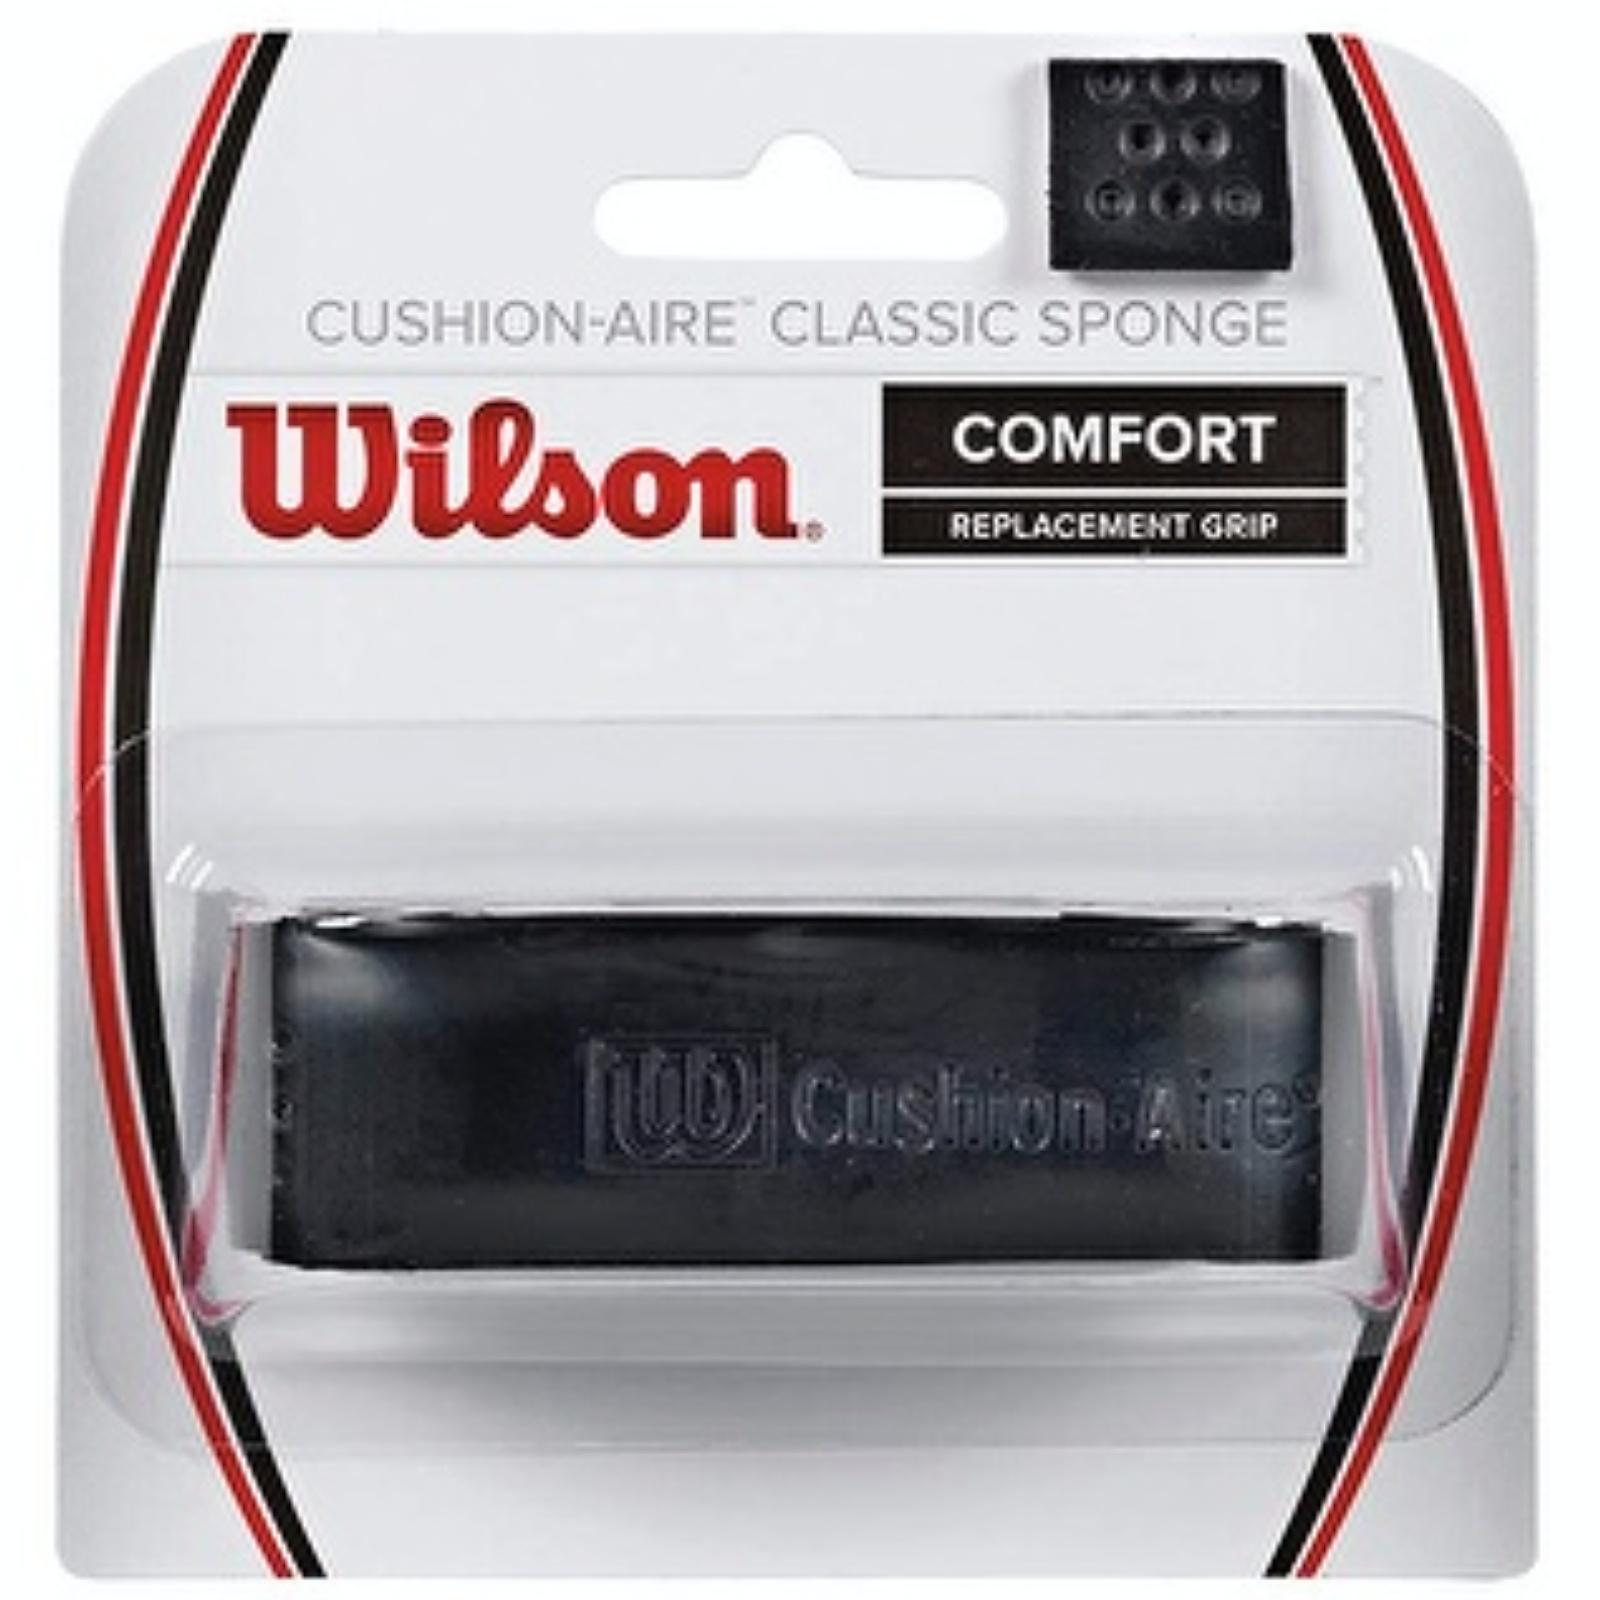 Squashová omotávka WILSON Cushion-Aire Classic Sponge